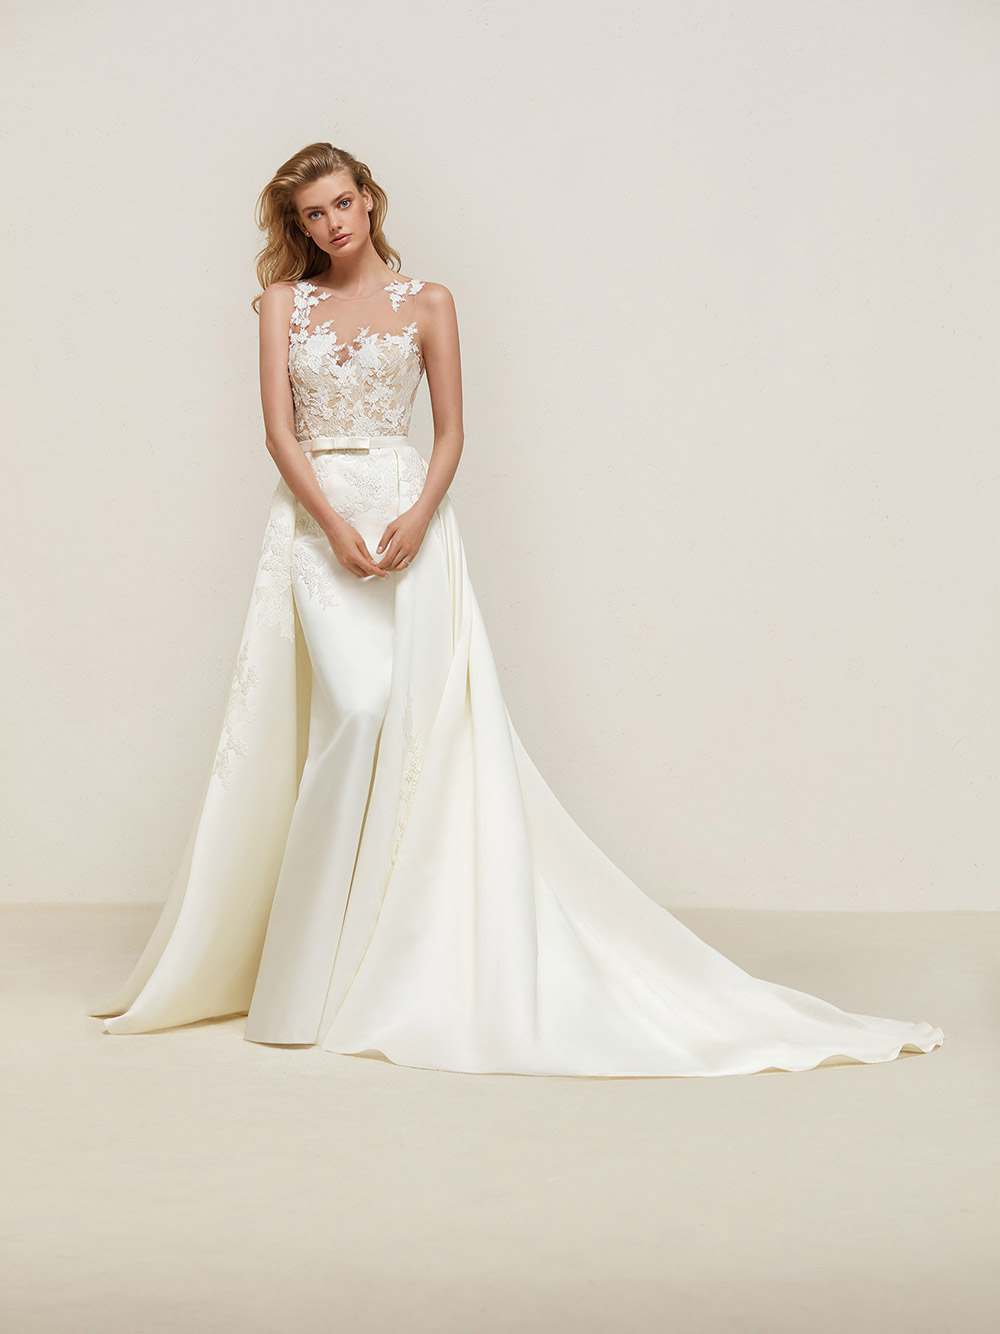 Dranoe - Pronovias 2018 Bridal Collection. www.theweddingnotebook.com